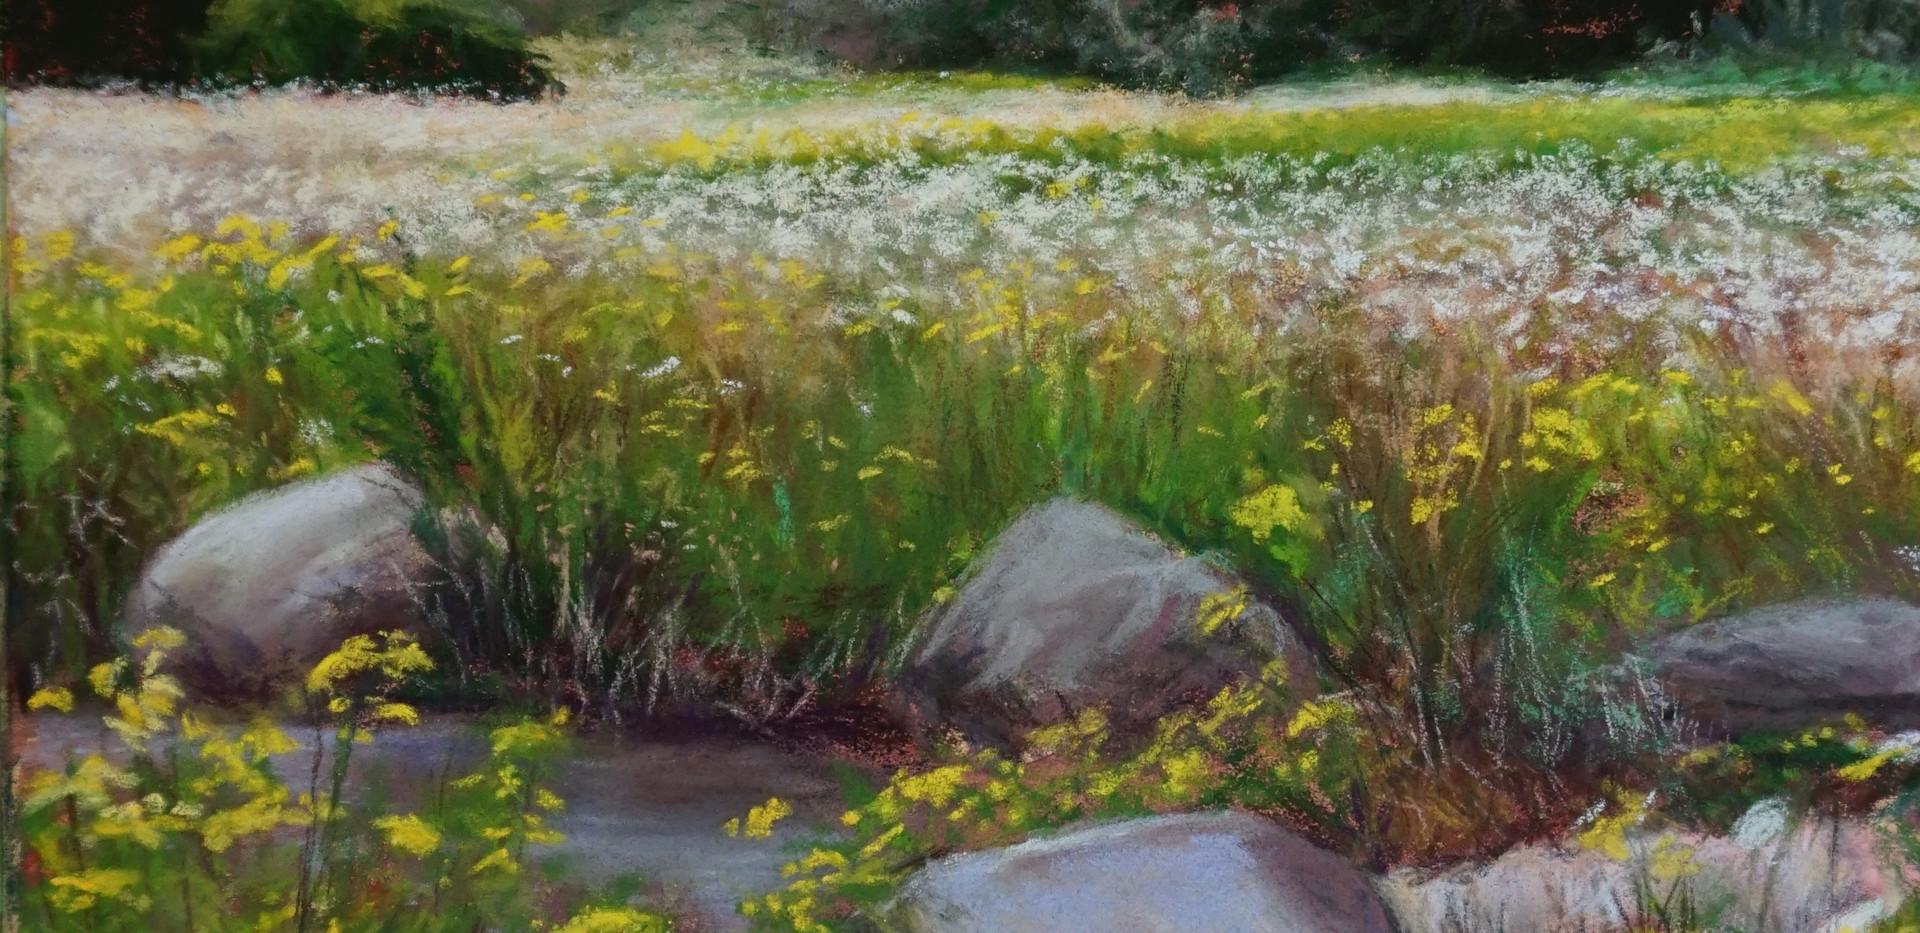 Midland Wildflowers